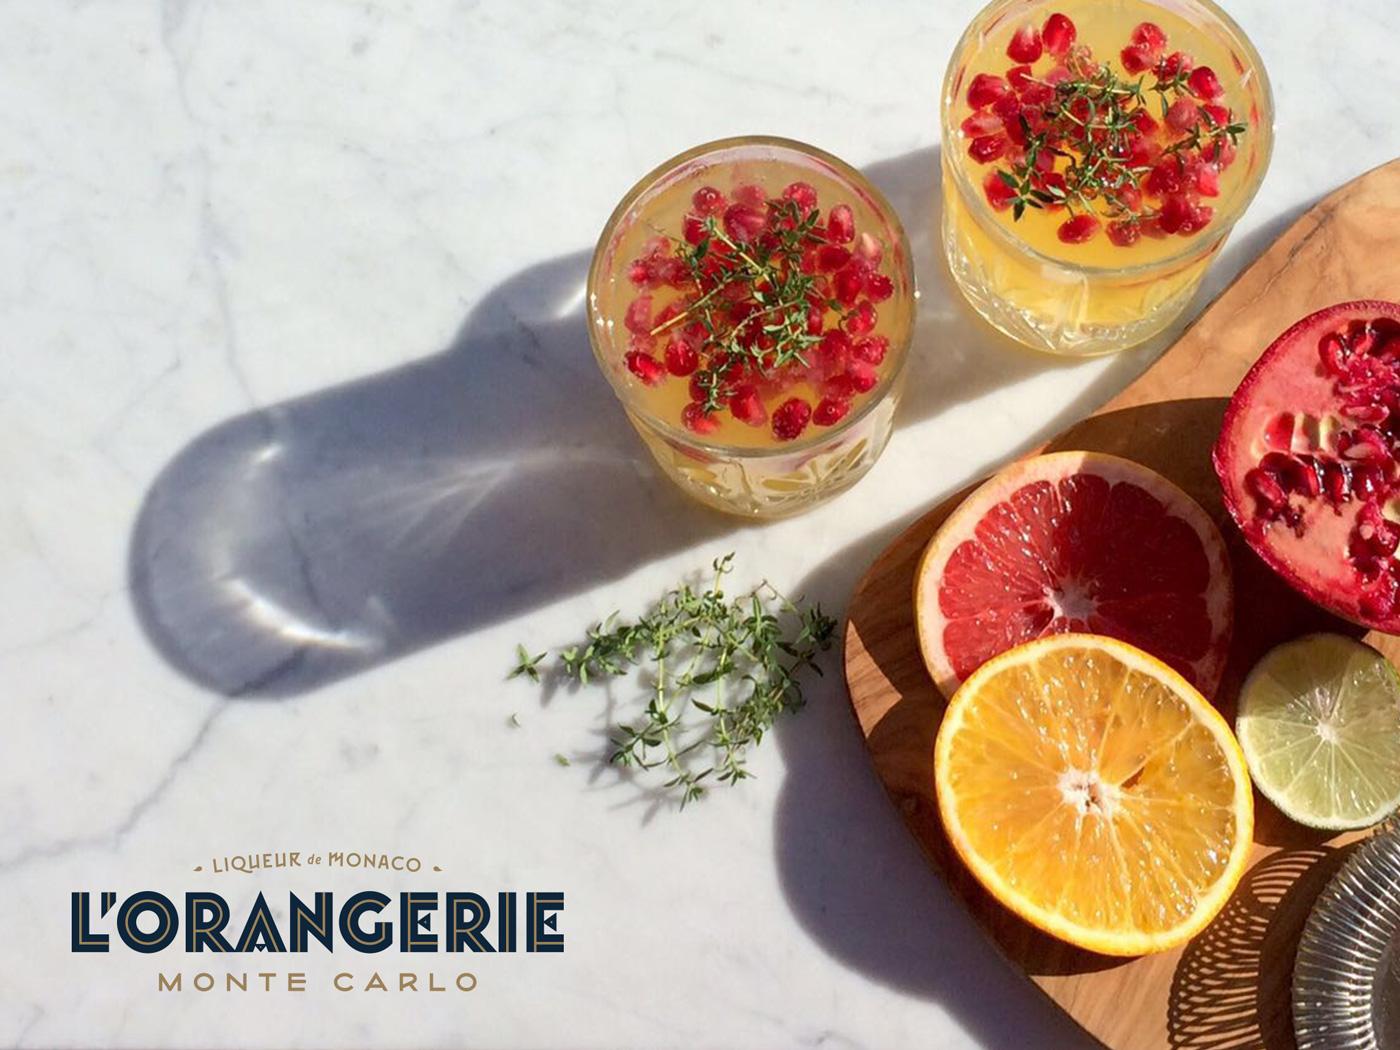 L'Orangerie Monte Carlo Orange Liqueur Lifestyle 2